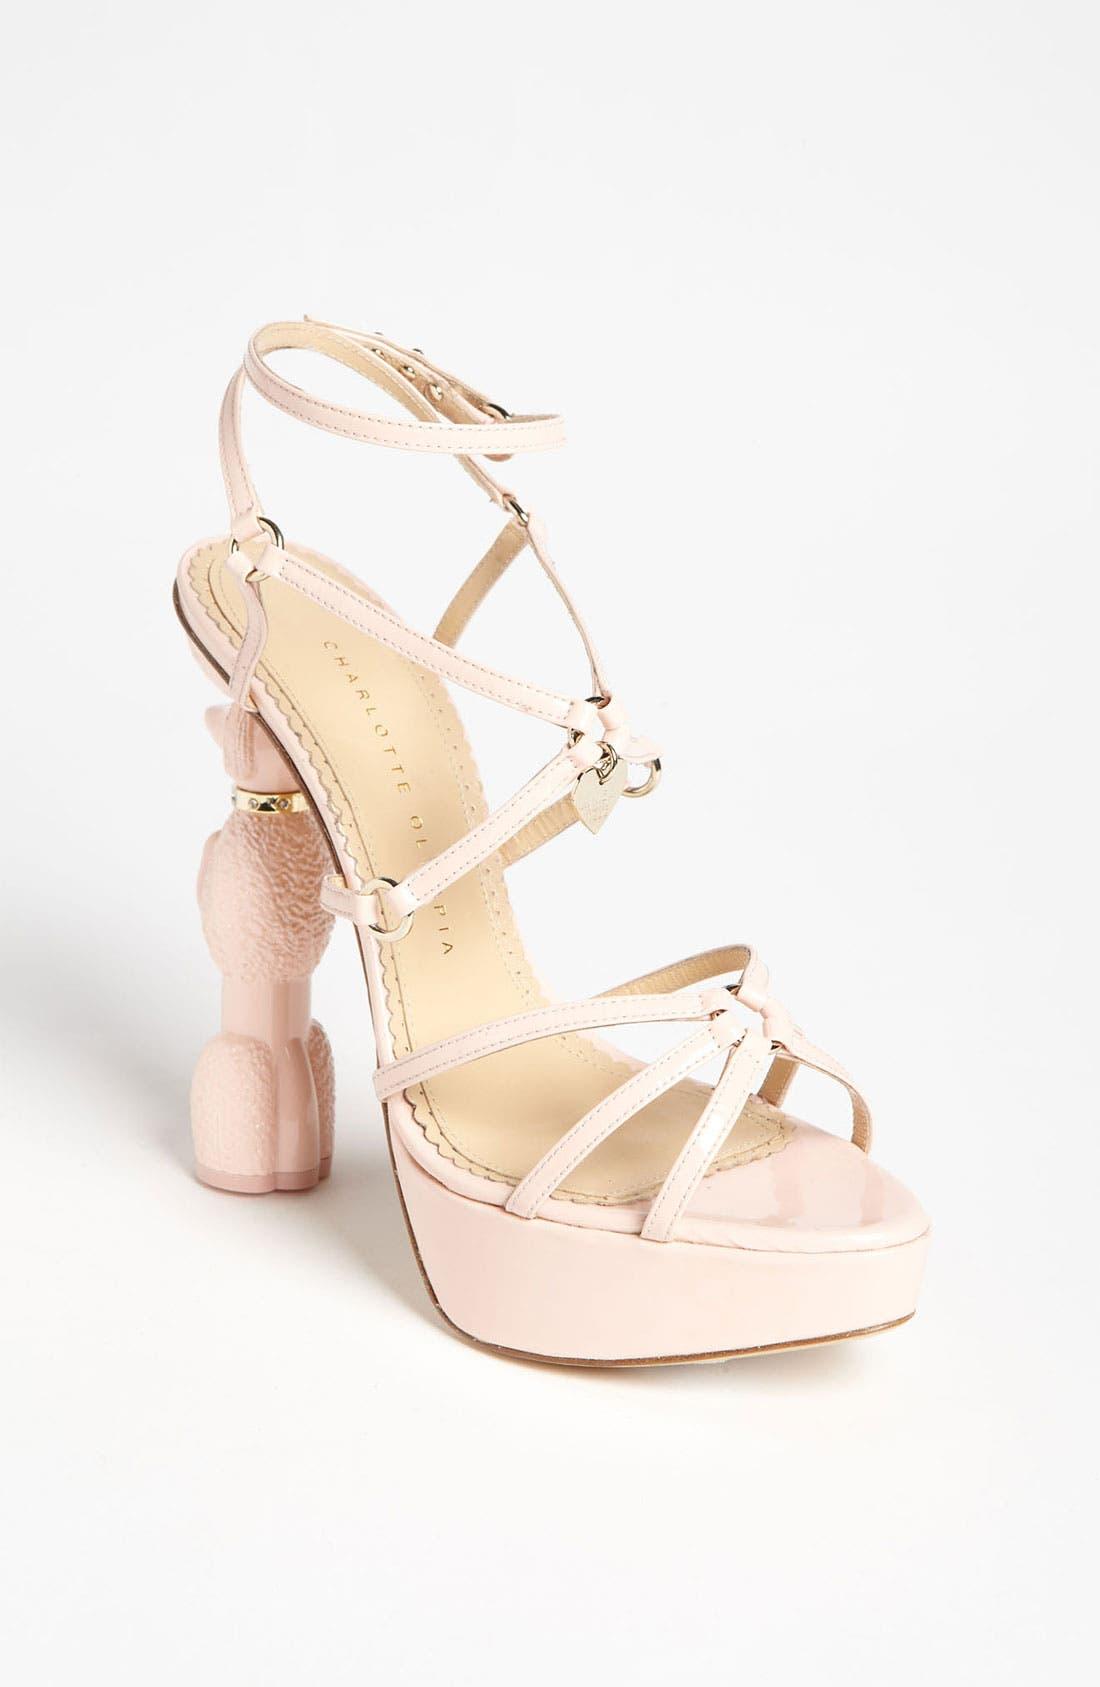 Main Image - Charlotte Olympia 'Cherie' Sandal